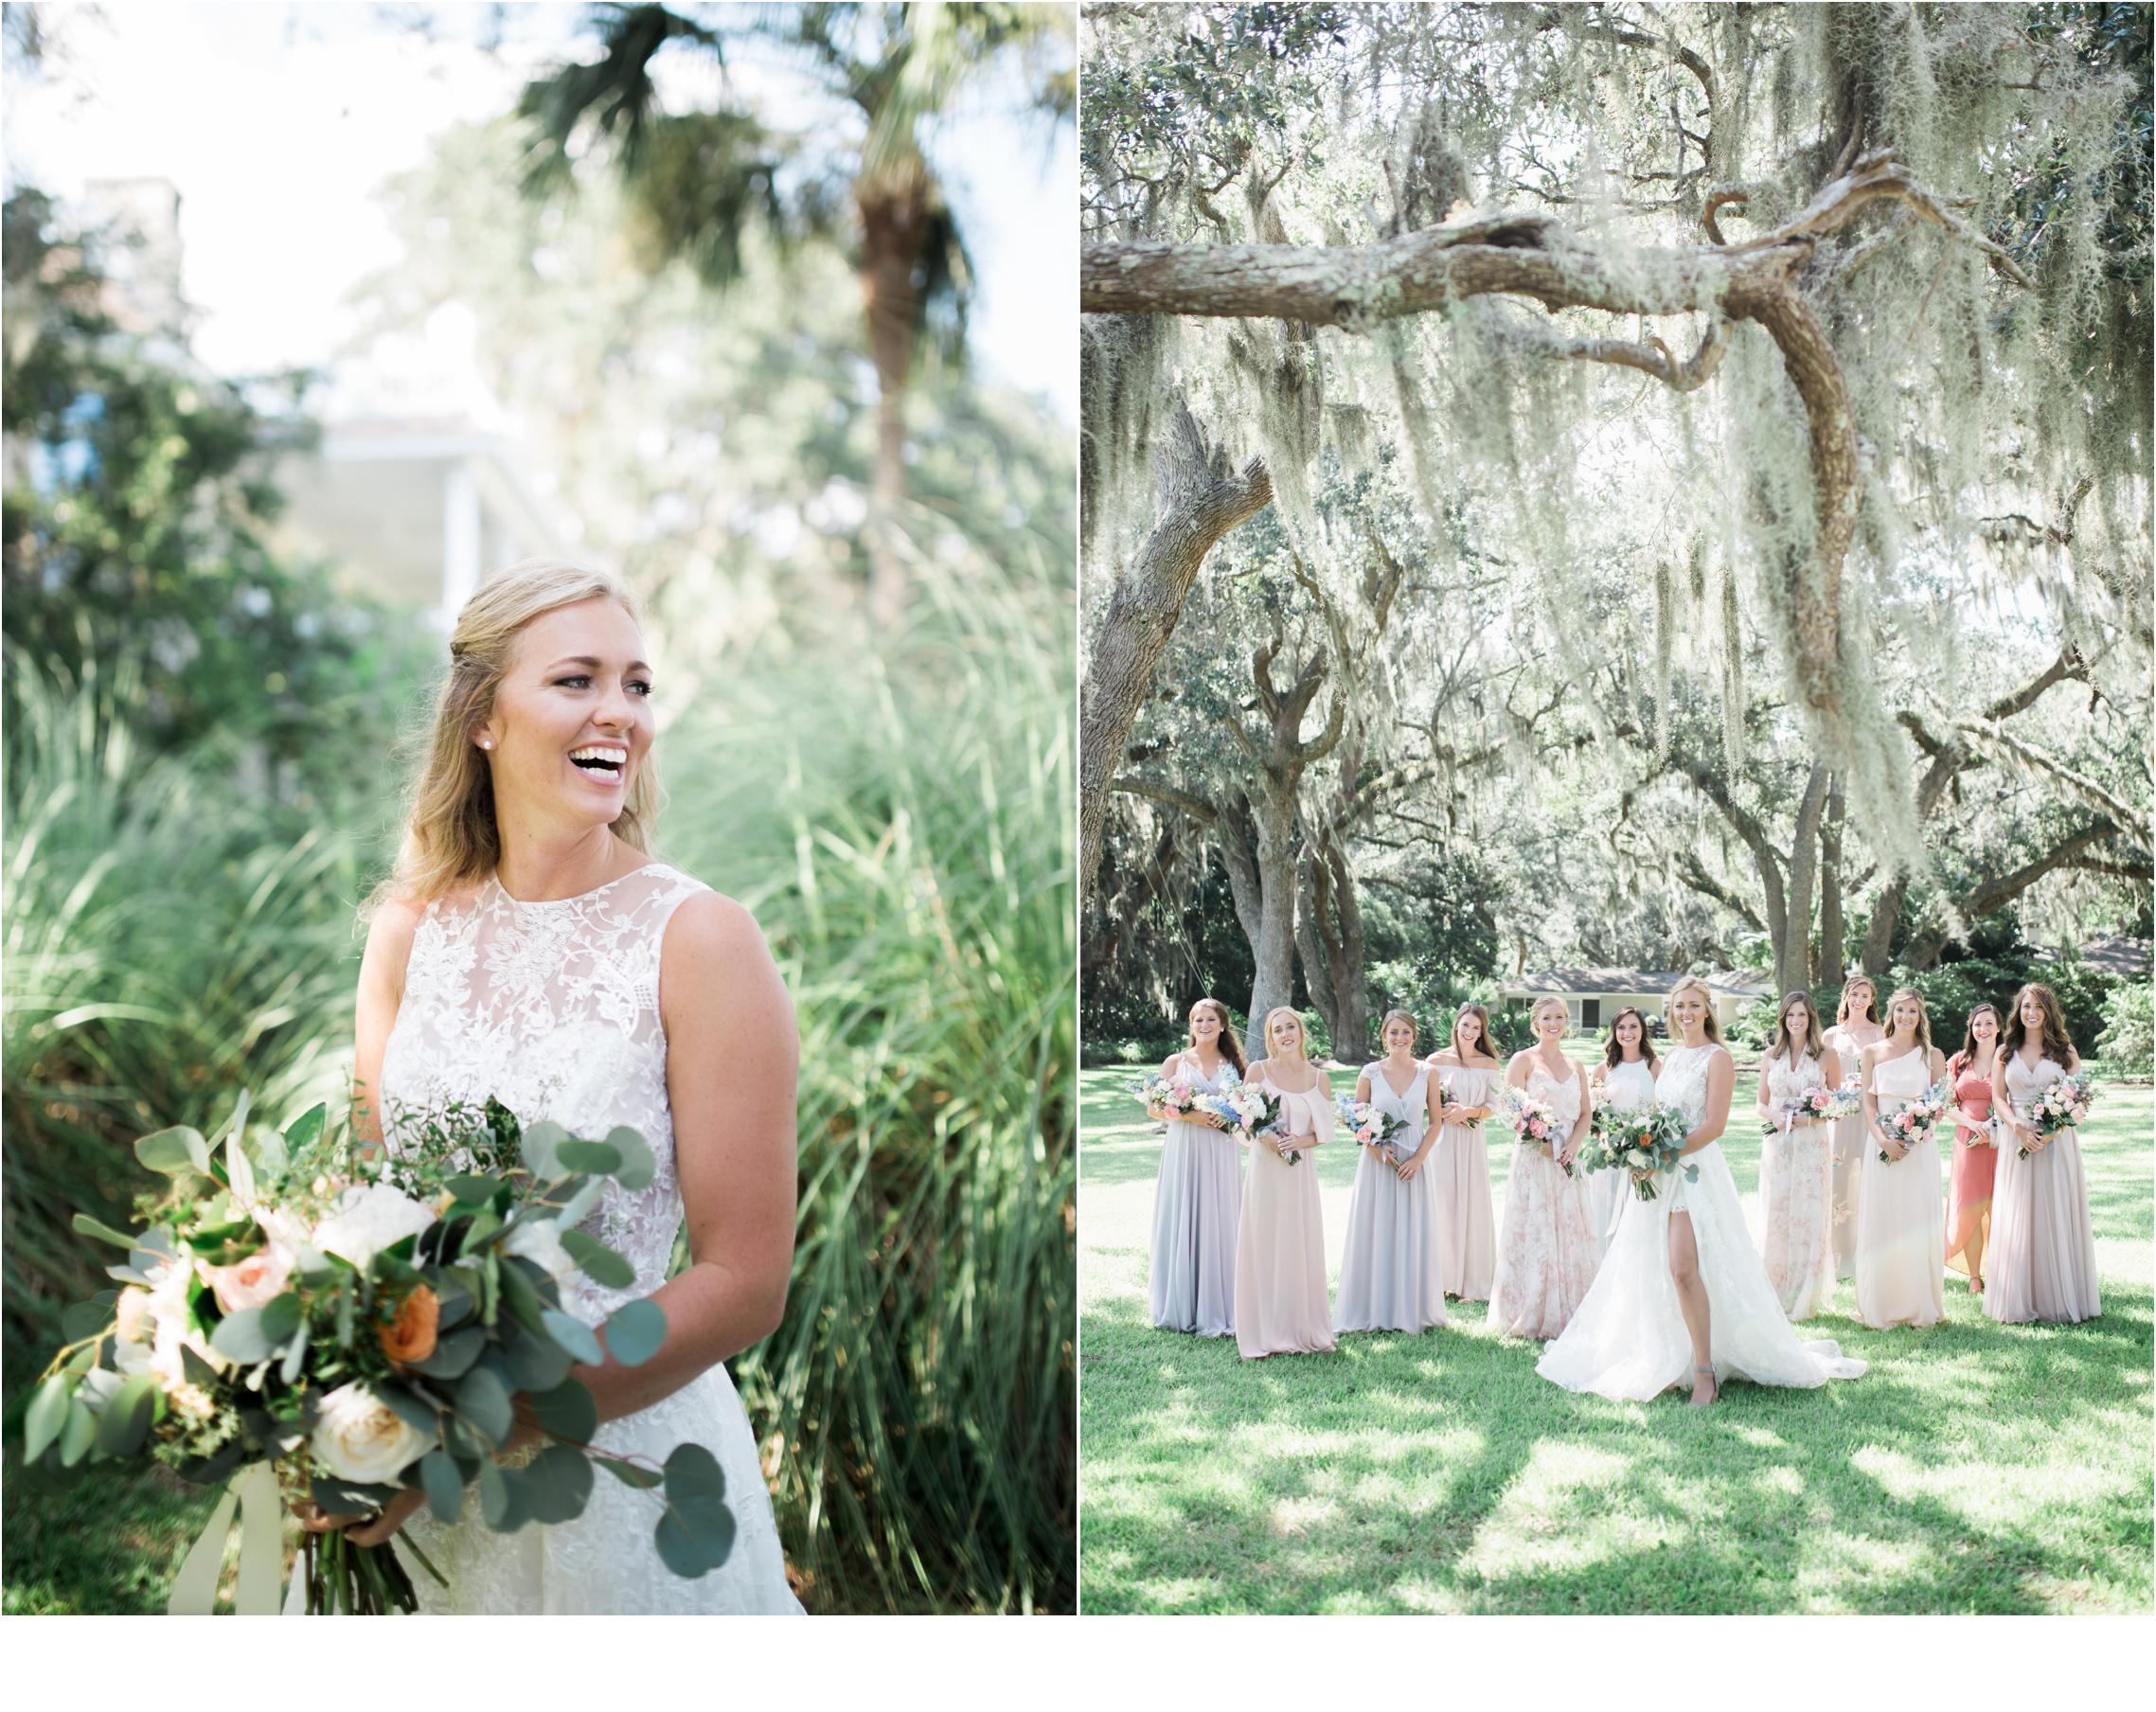 Rainey_Gregg_Photography_St._Simons_Island_Georgia_California_Wedding_Portrait_Photography_0049.jpg